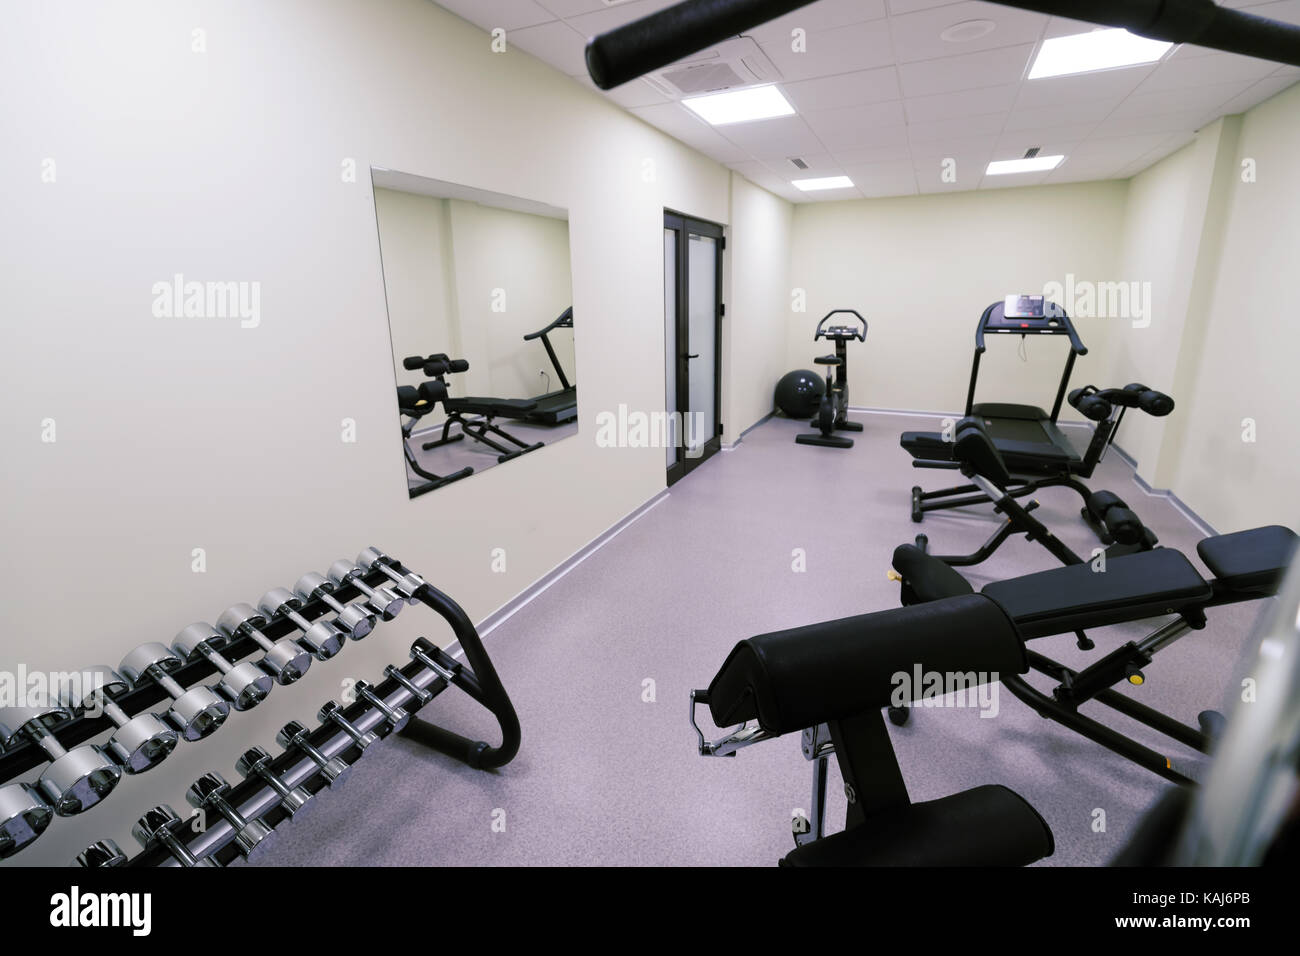 Home luxury gym stock photos